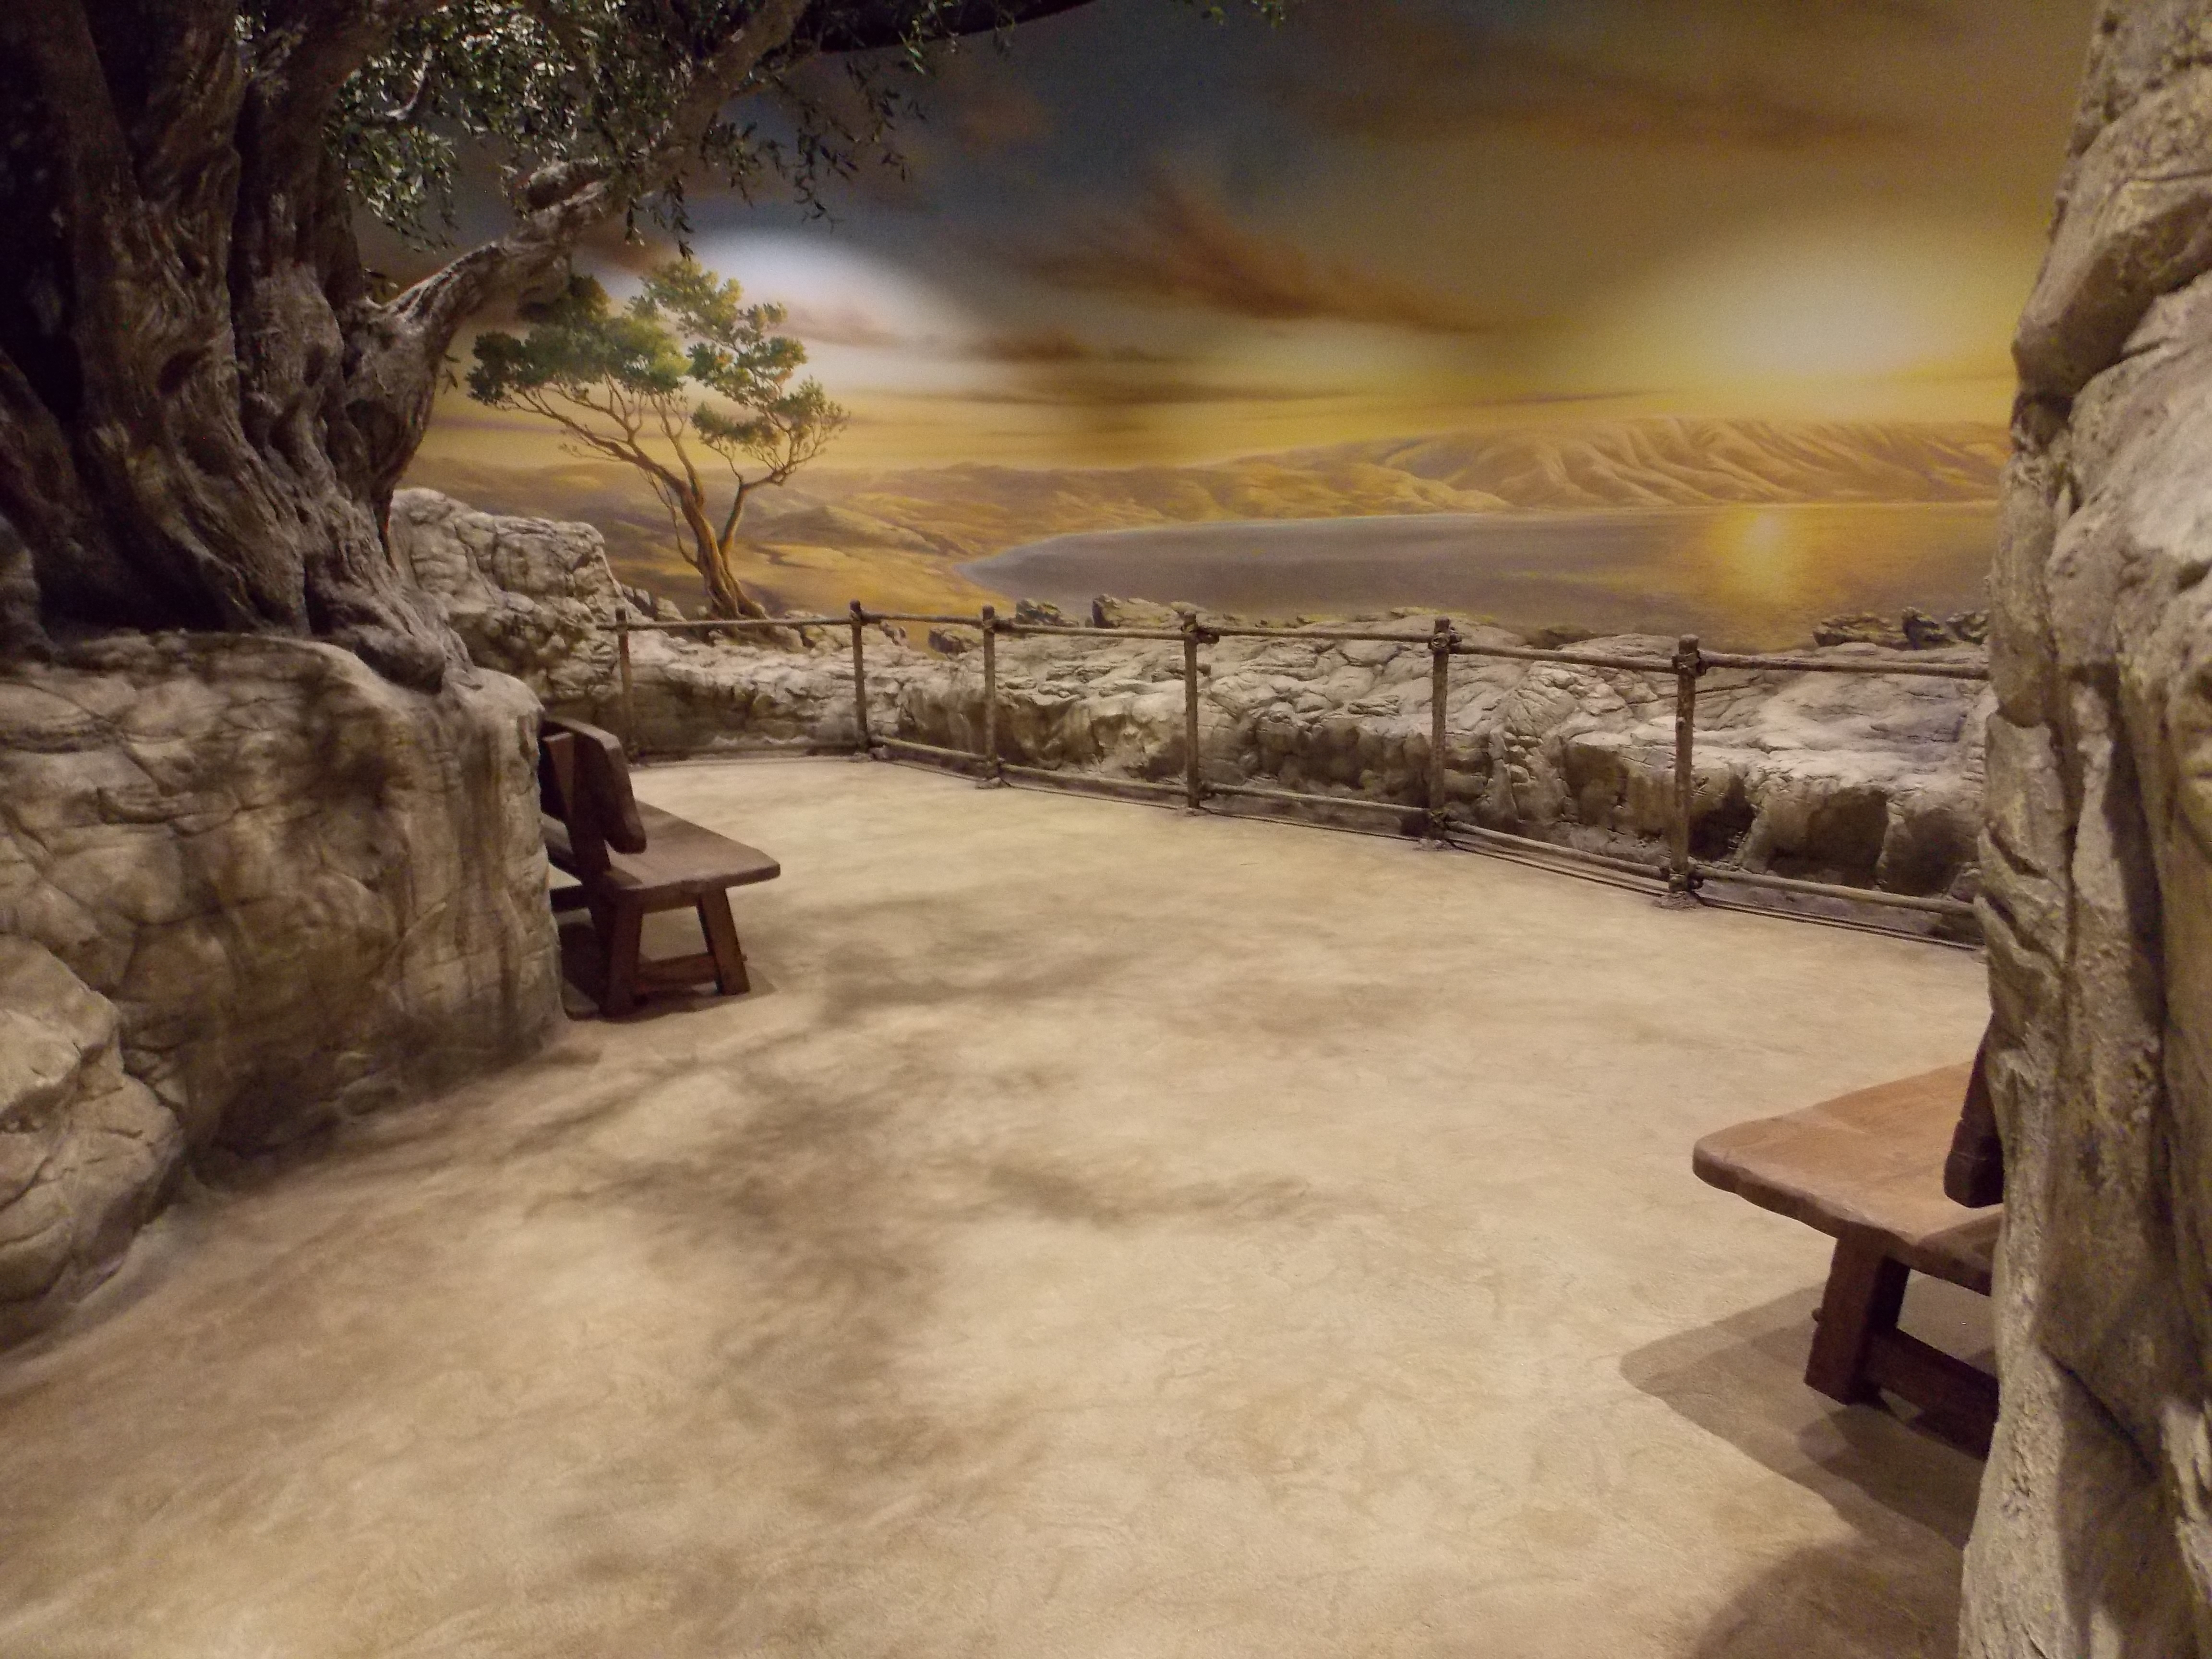 Bible Museum's Dirt Floors Made with SUNDEK Decorative Concrete